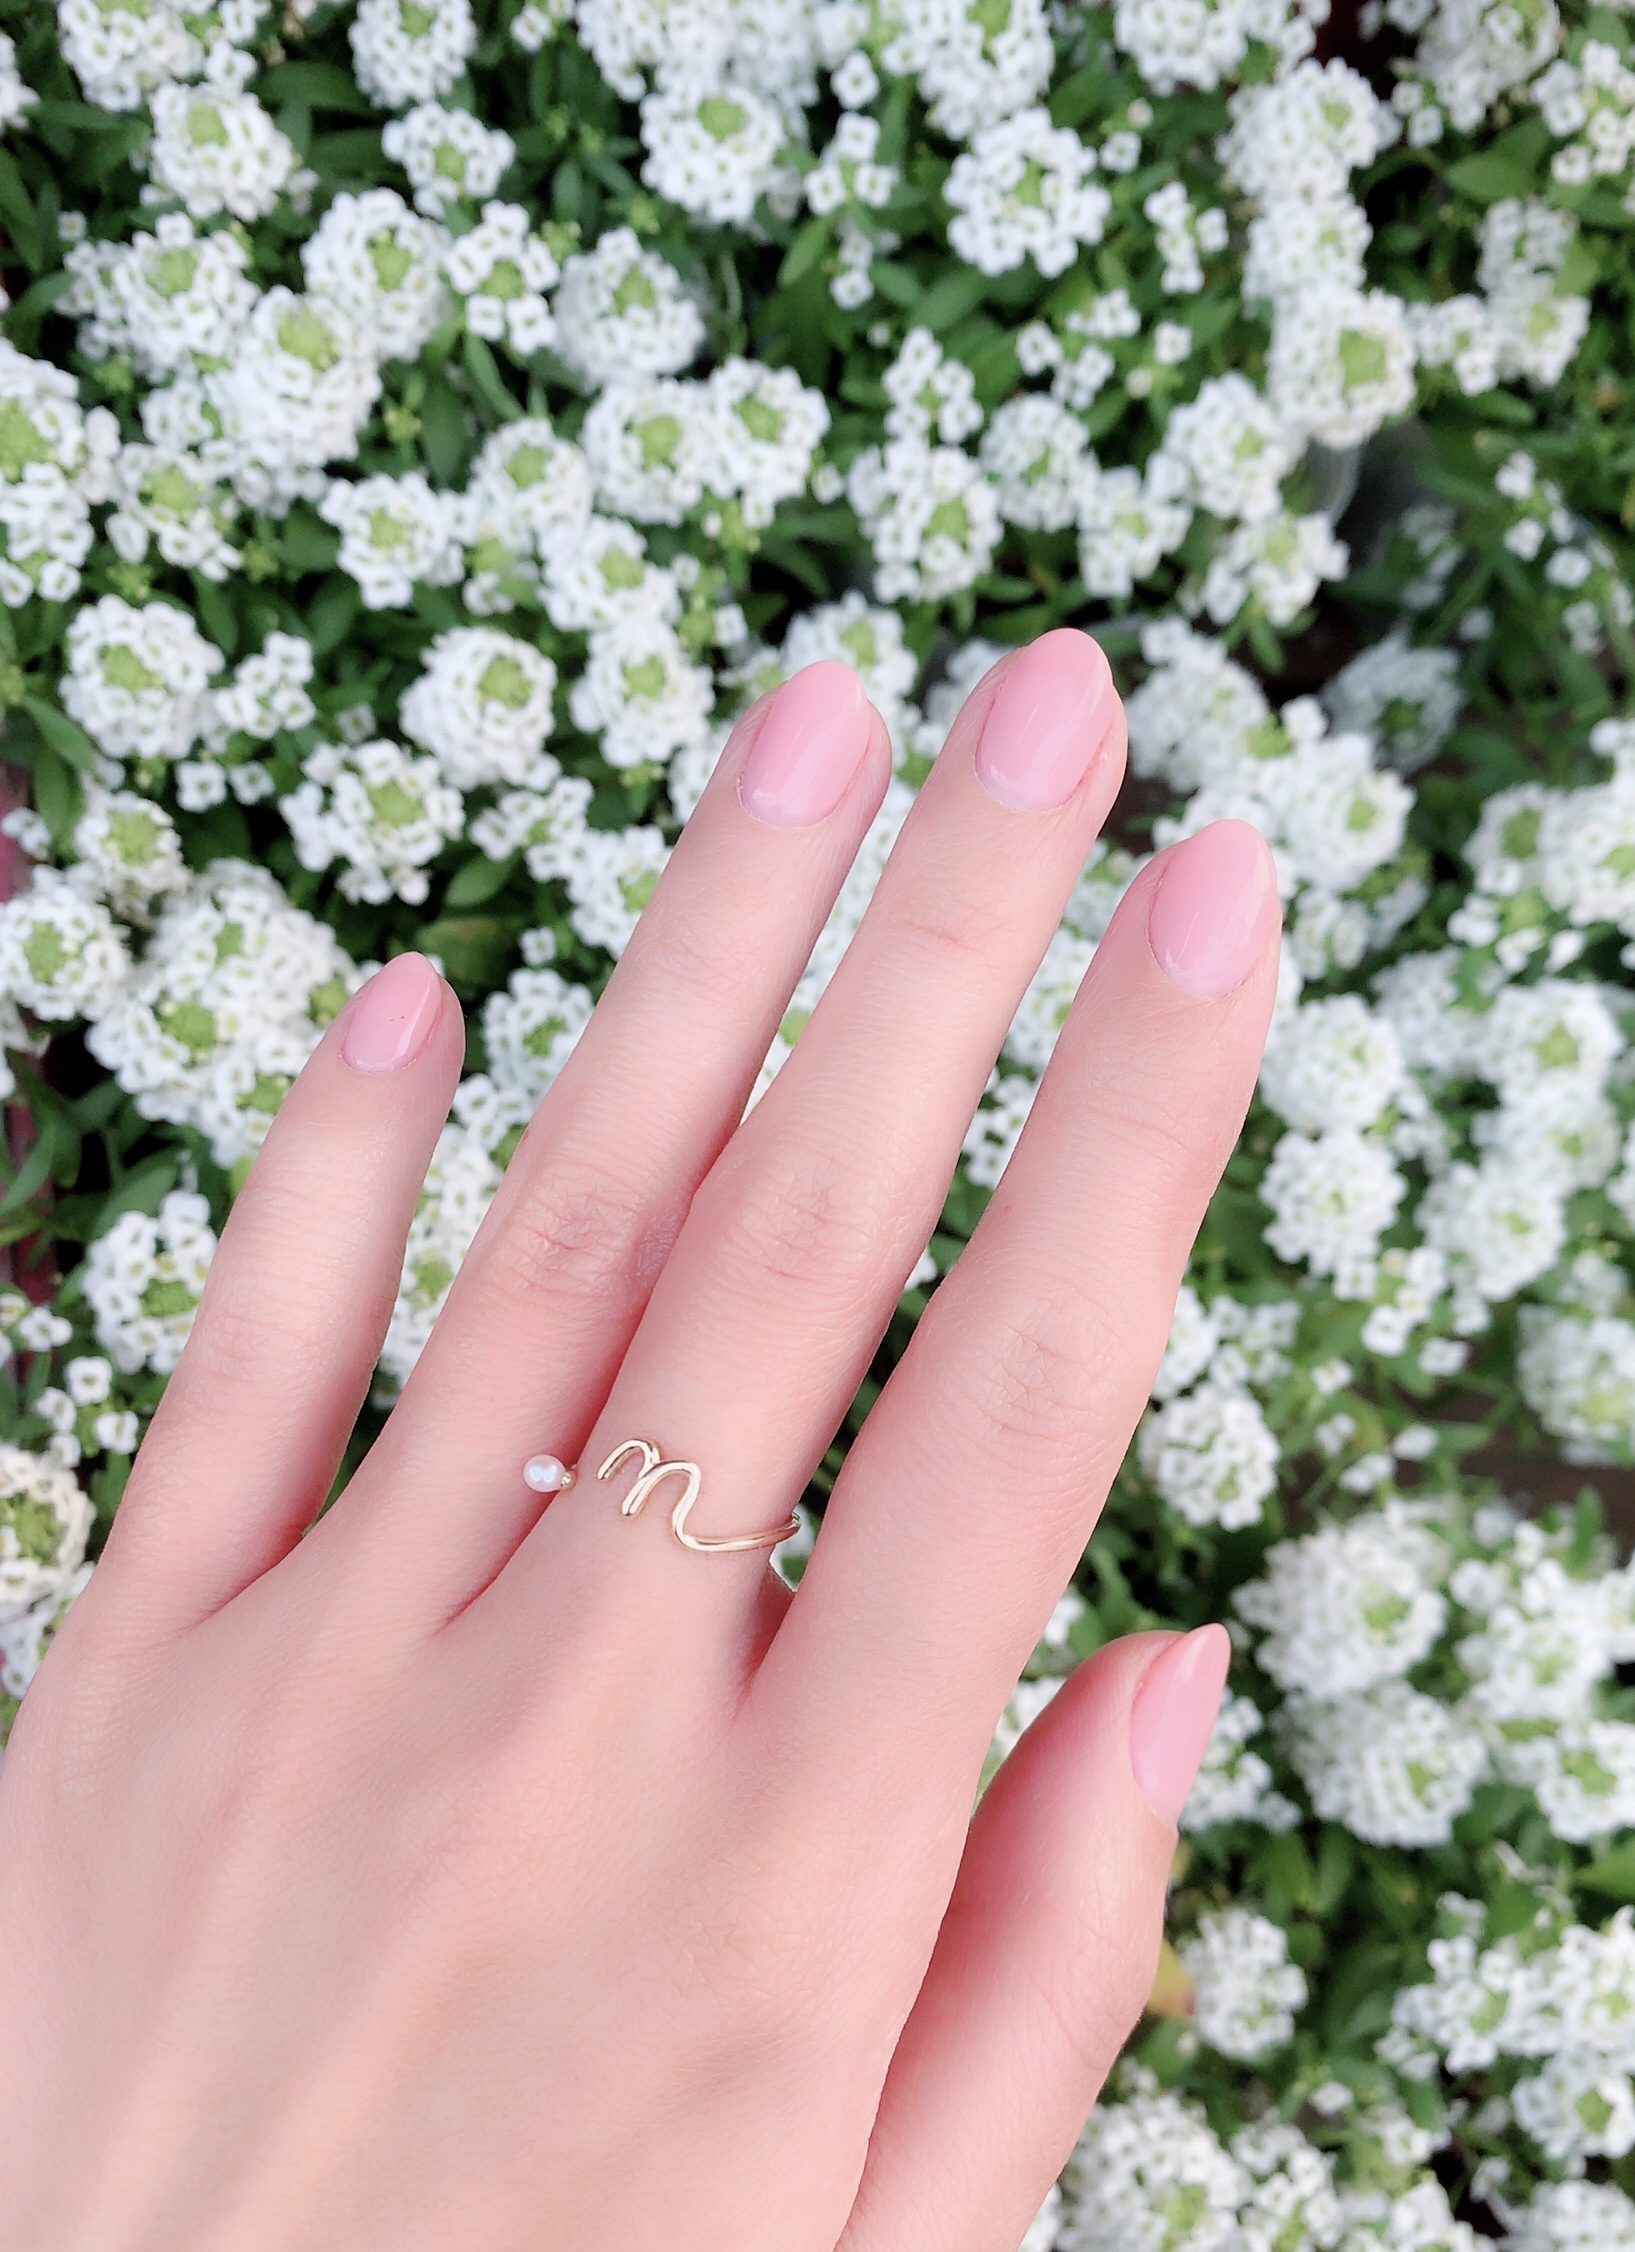 【selva secreta】Initials pearl ring